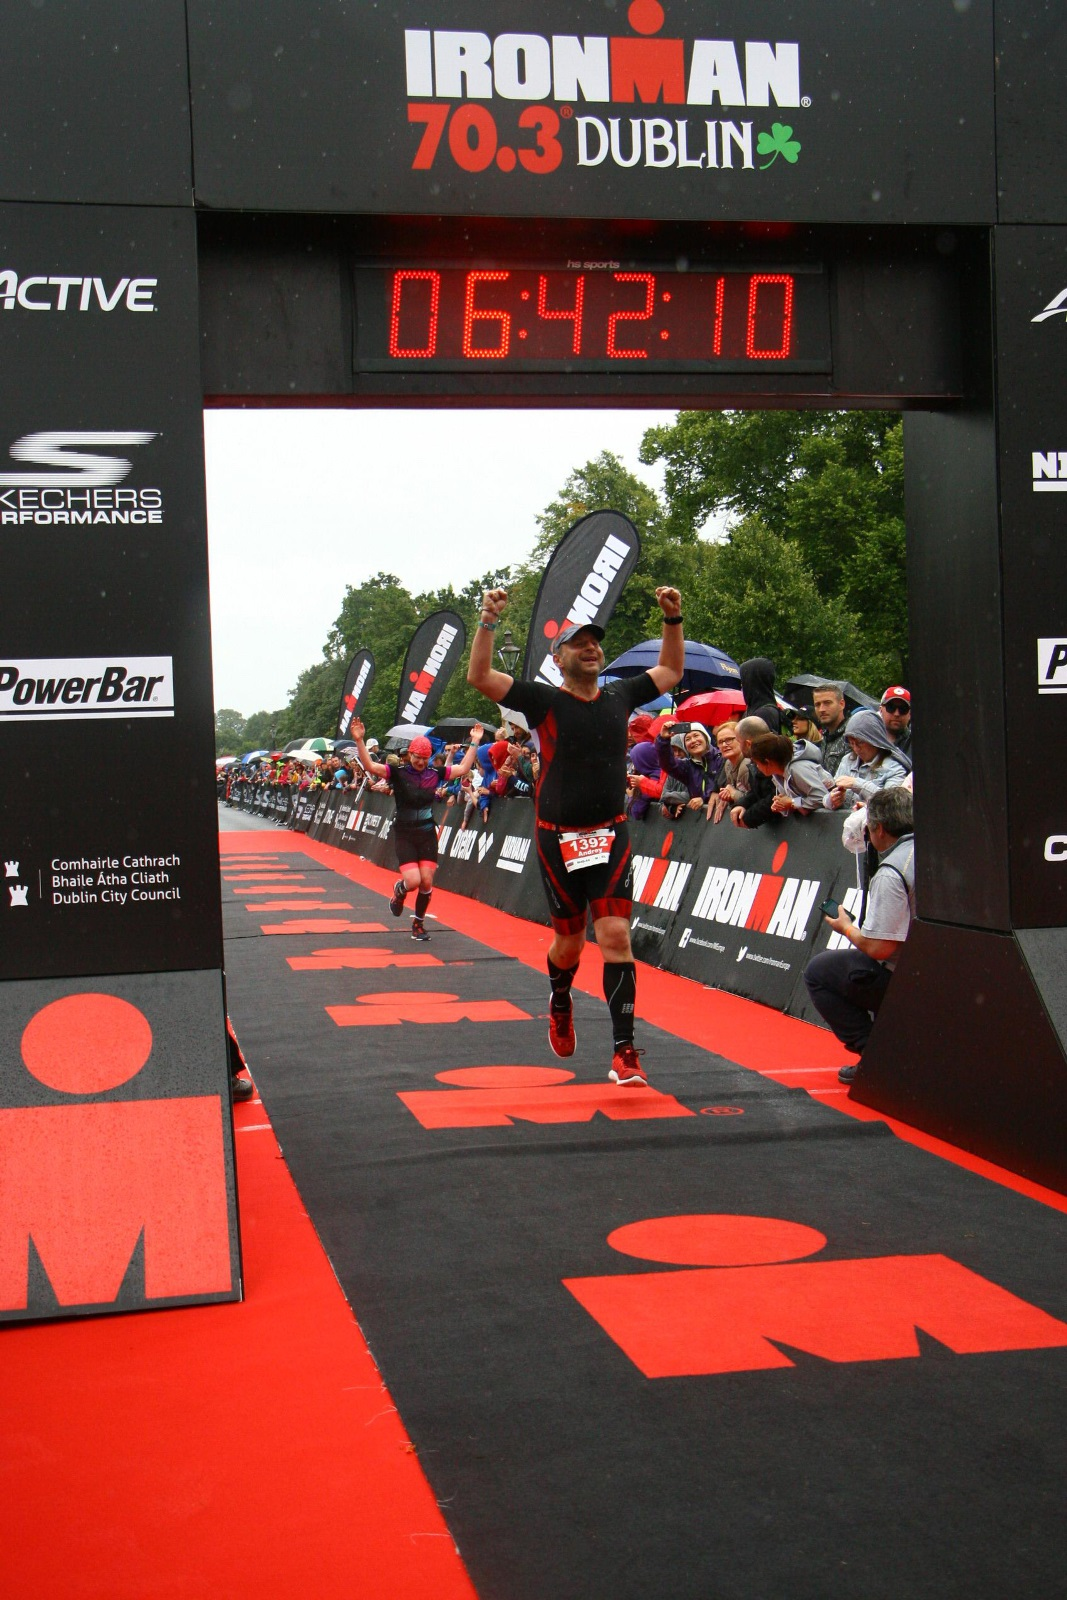 Финиш на Ironman 70.3 Dublin